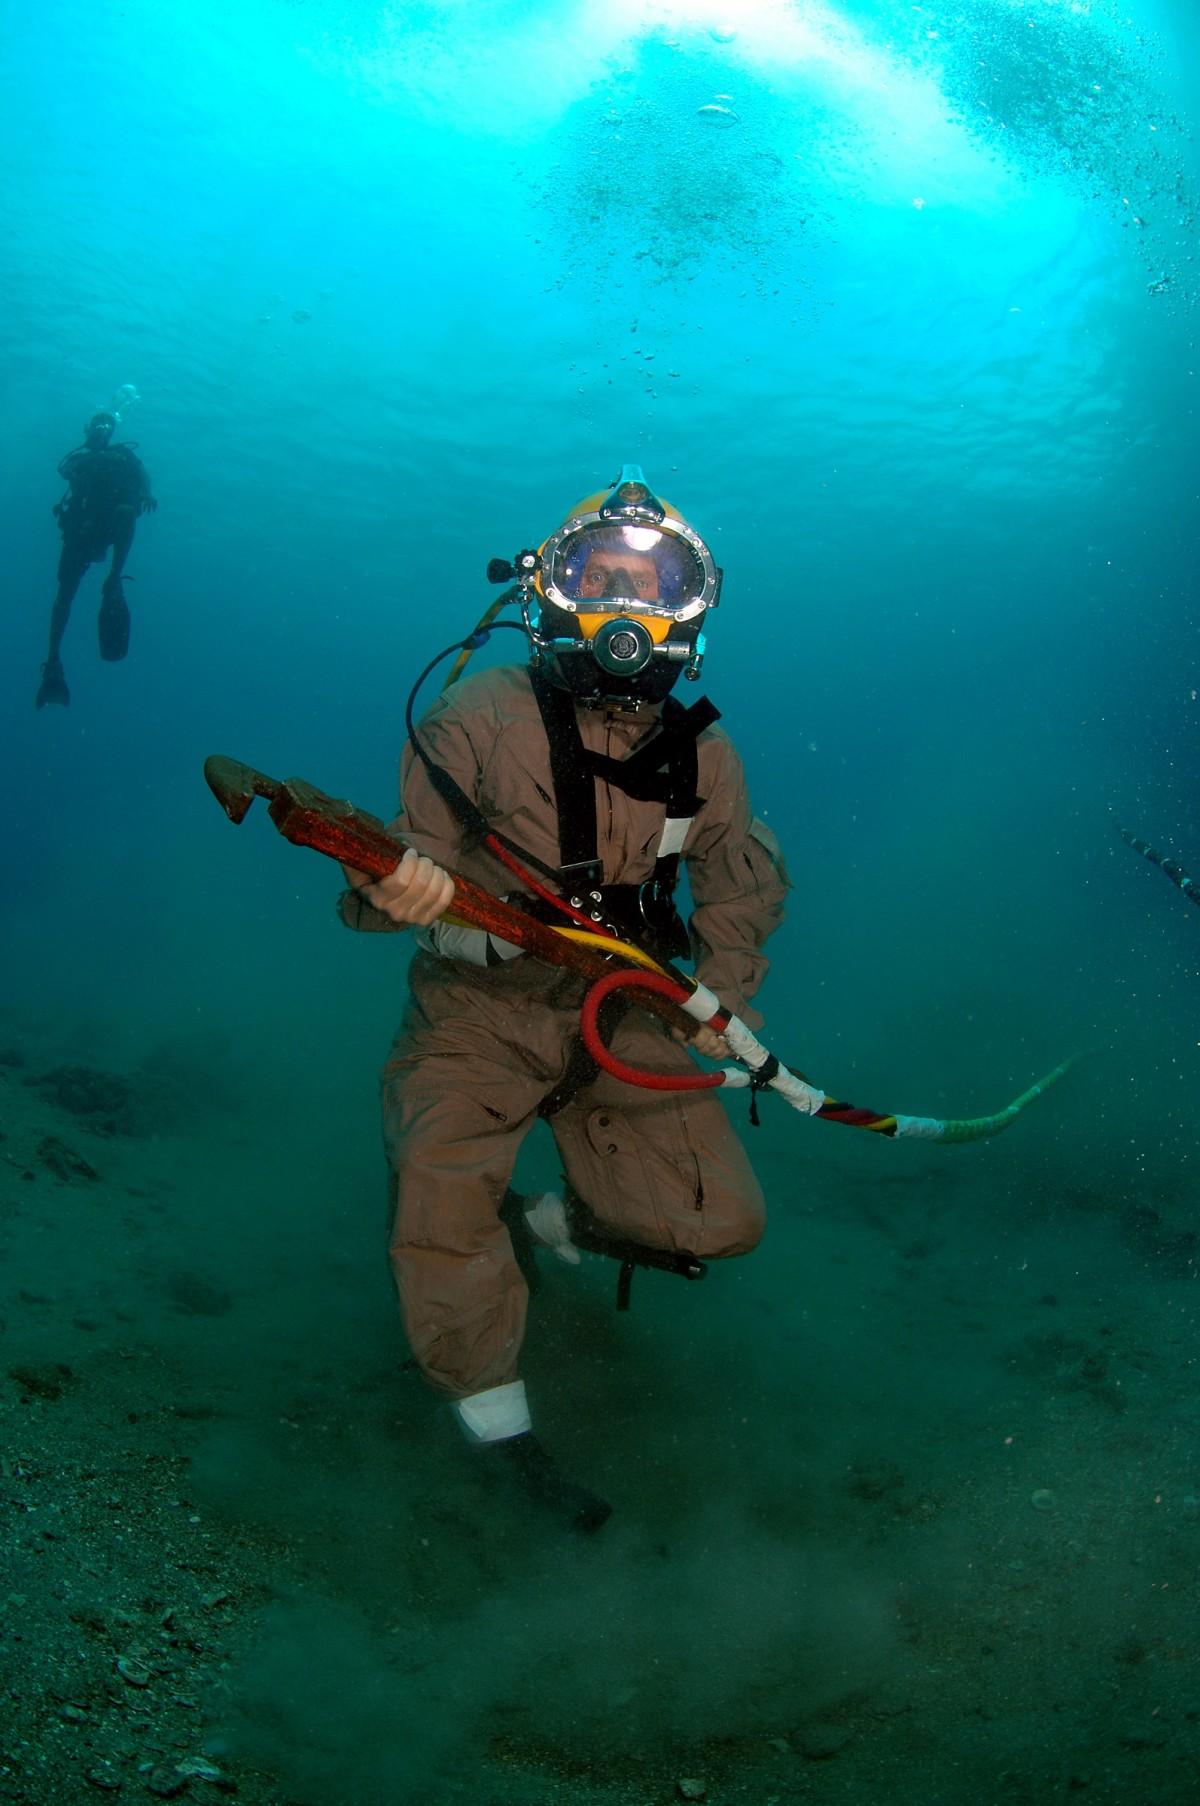 Free Images : Working, Sea, Walking, Tool, Military